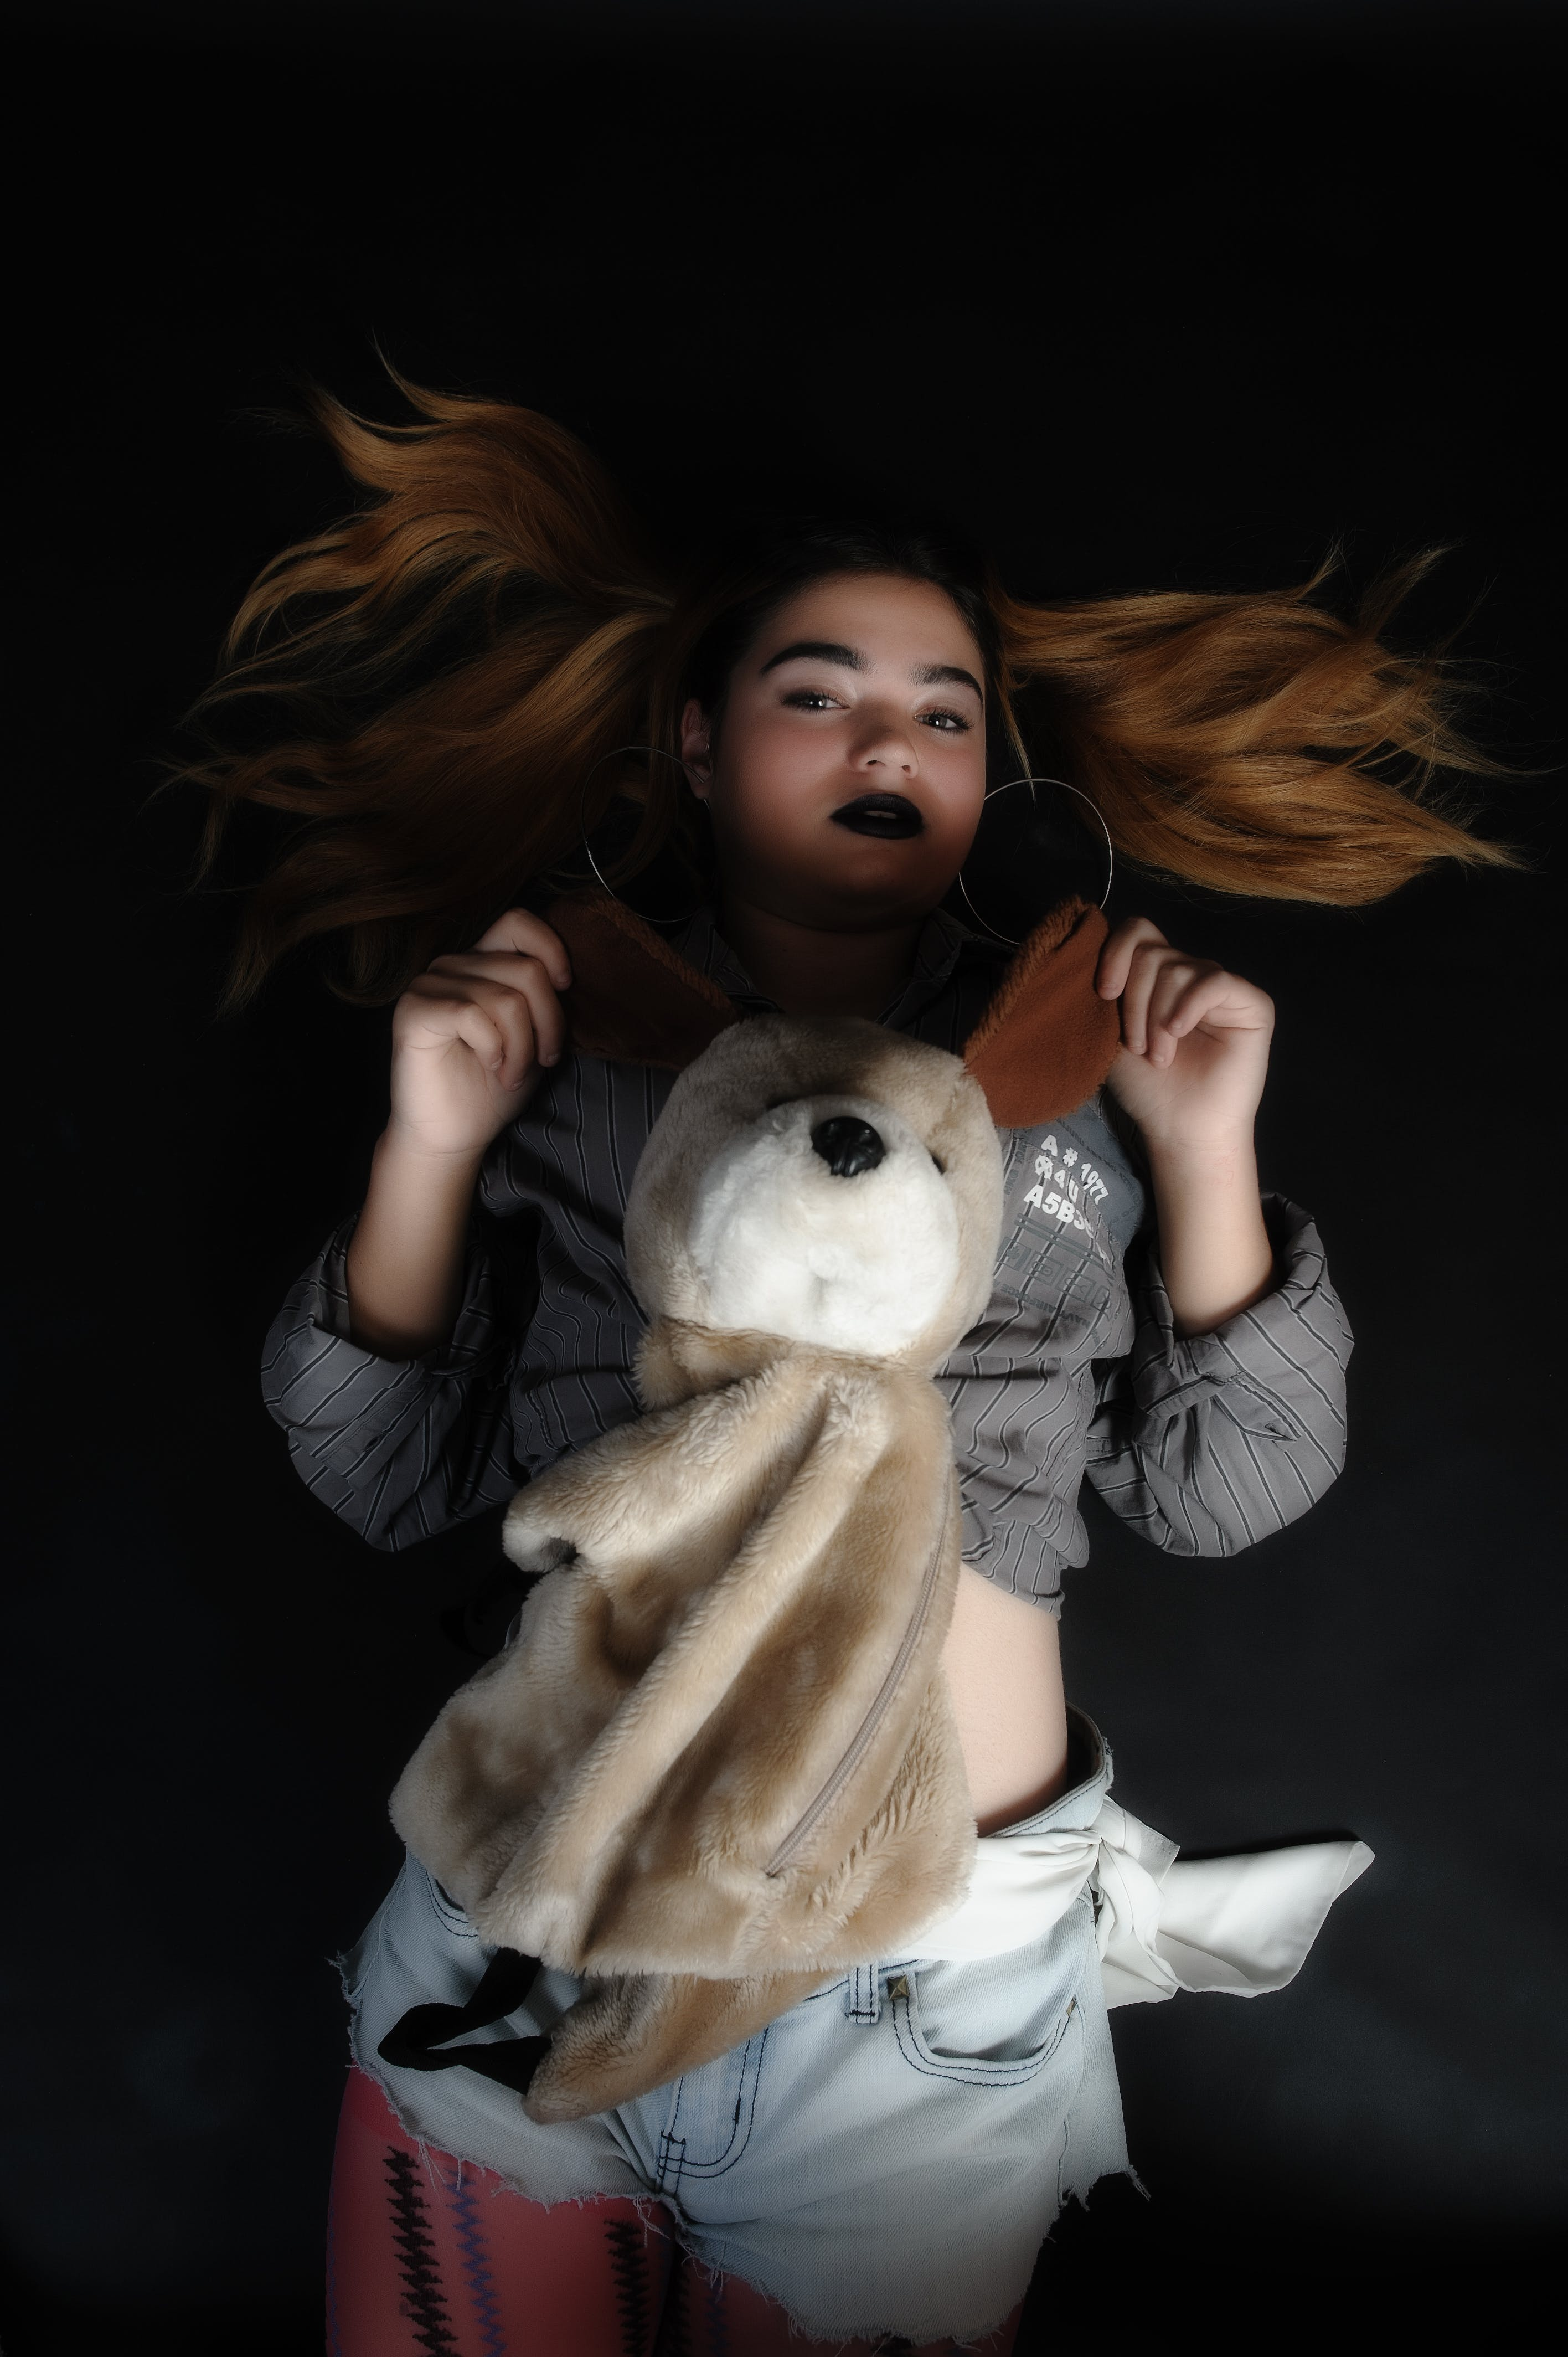 Woman Lying on Black Textile